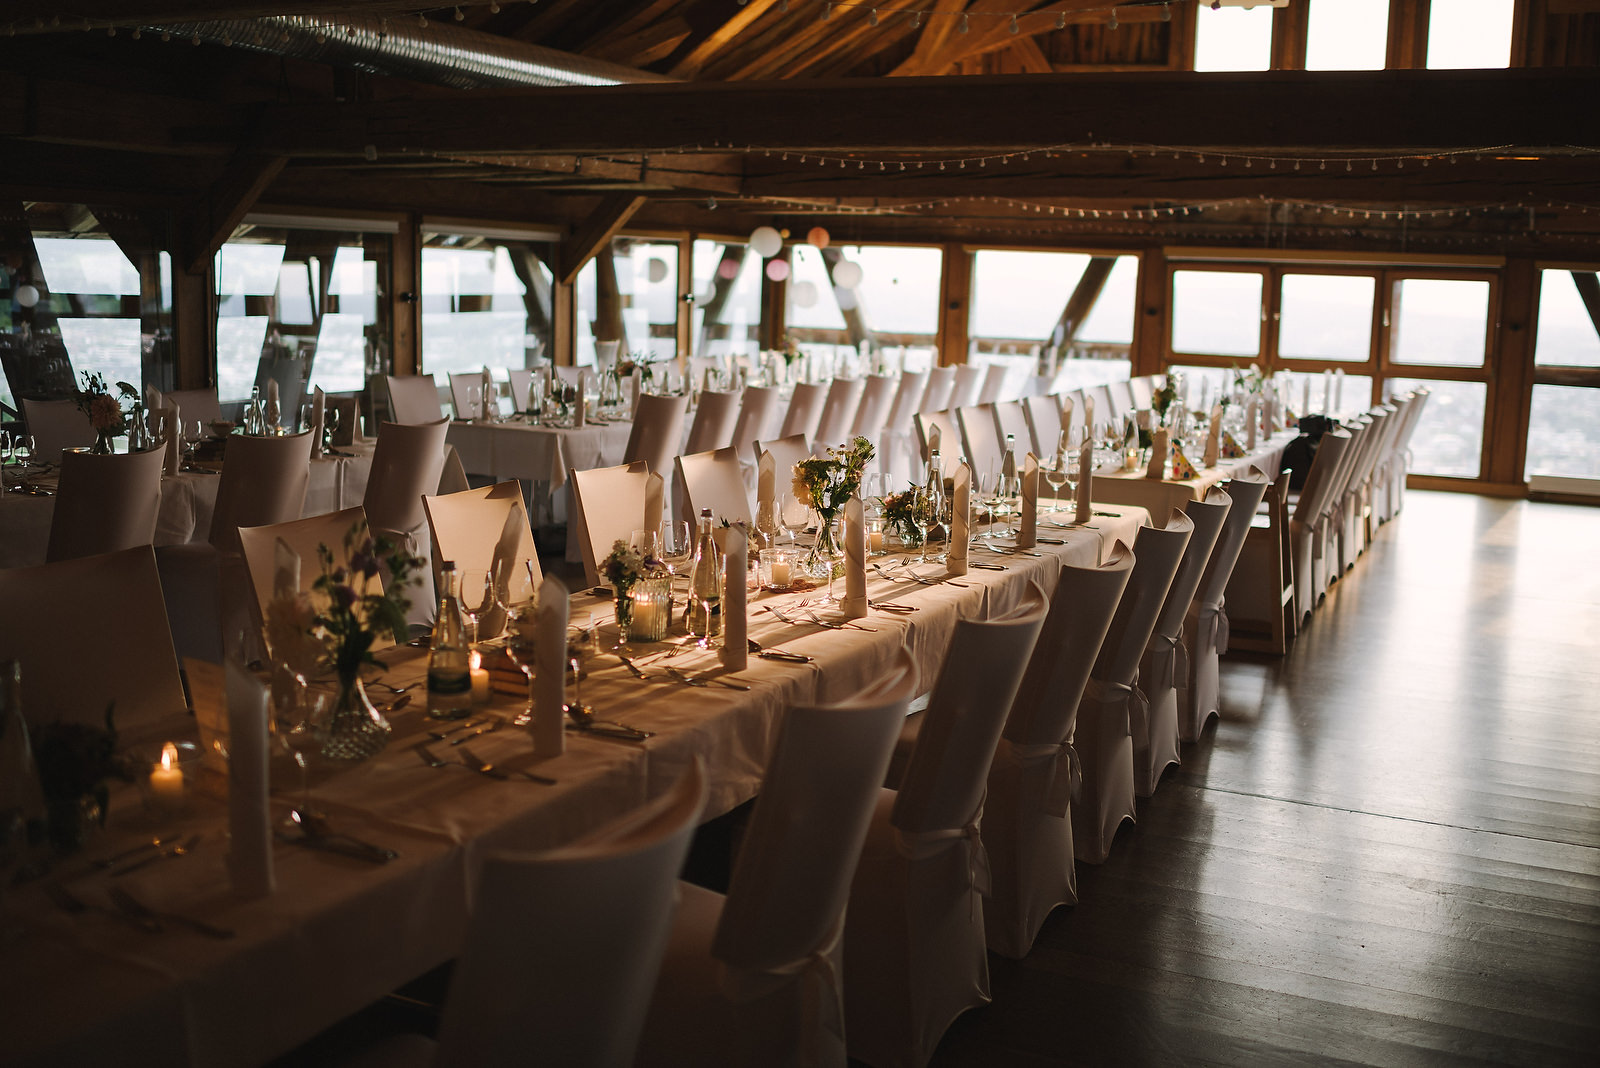 Fotograf Konstanz - Hochzeitsfotograf Reutlingen Achalm Hochzeit EFP 73 - Als Hochzeitsfotograf auf der Achalm, Reutlingen  - 57 -